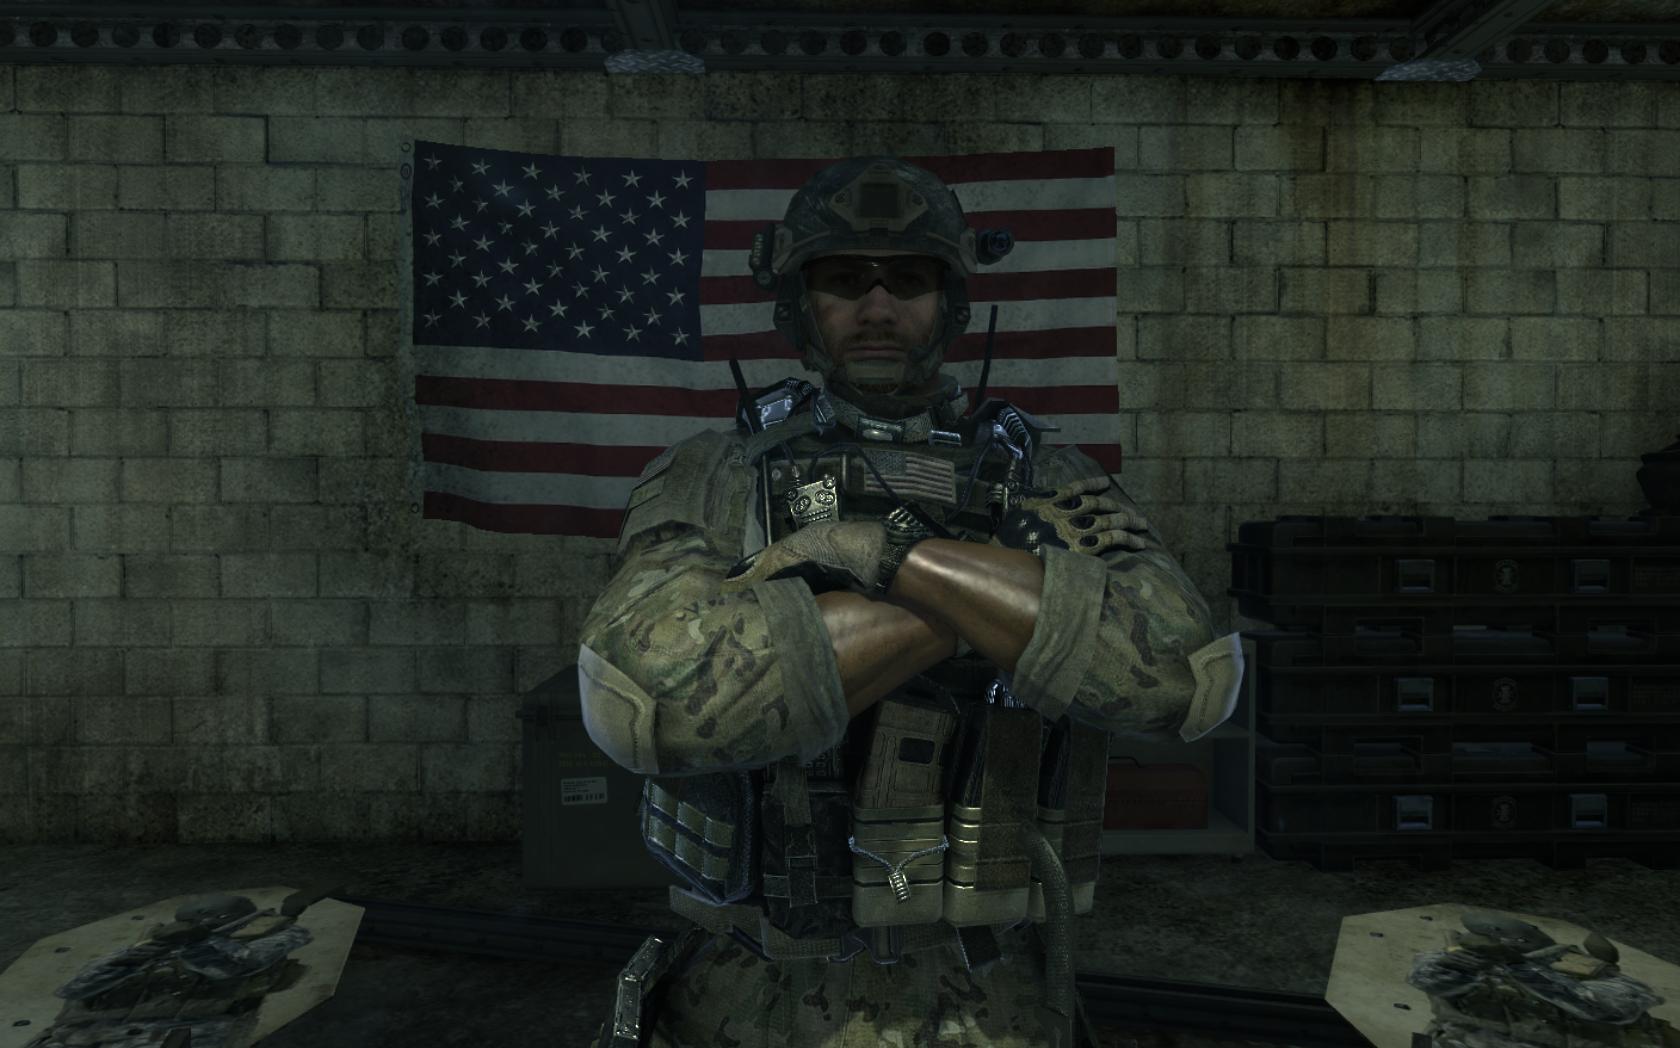 Call of Duty: Modern Warfare 3 - Sandman Metal-01 | Call of Duty ...